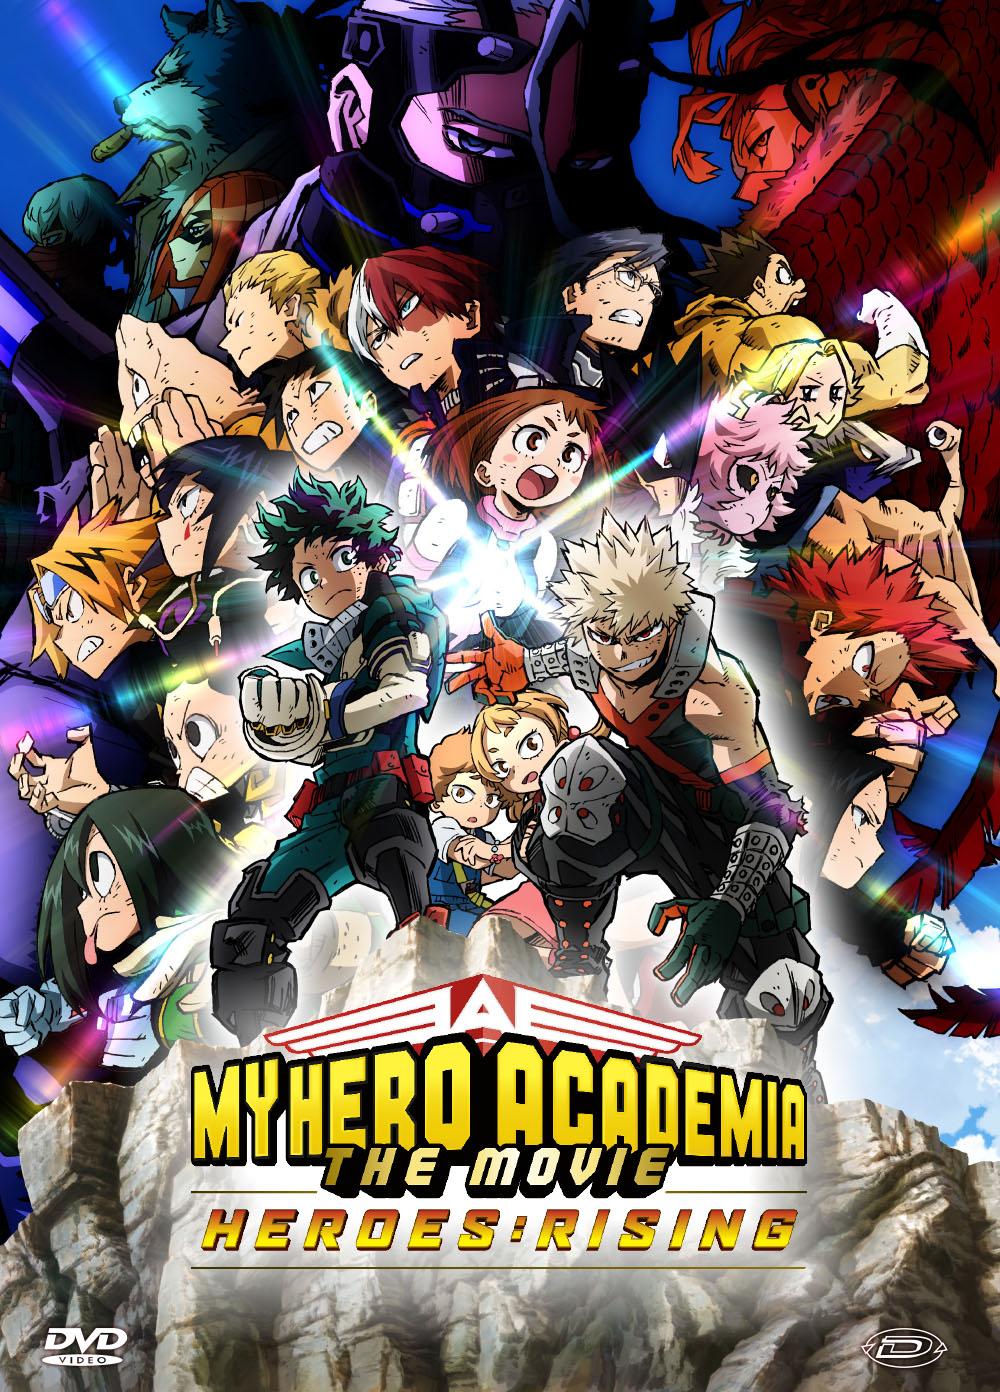 MY HERO ACADEMIA - THE MOVIE - HEROES: RISING (DVD)